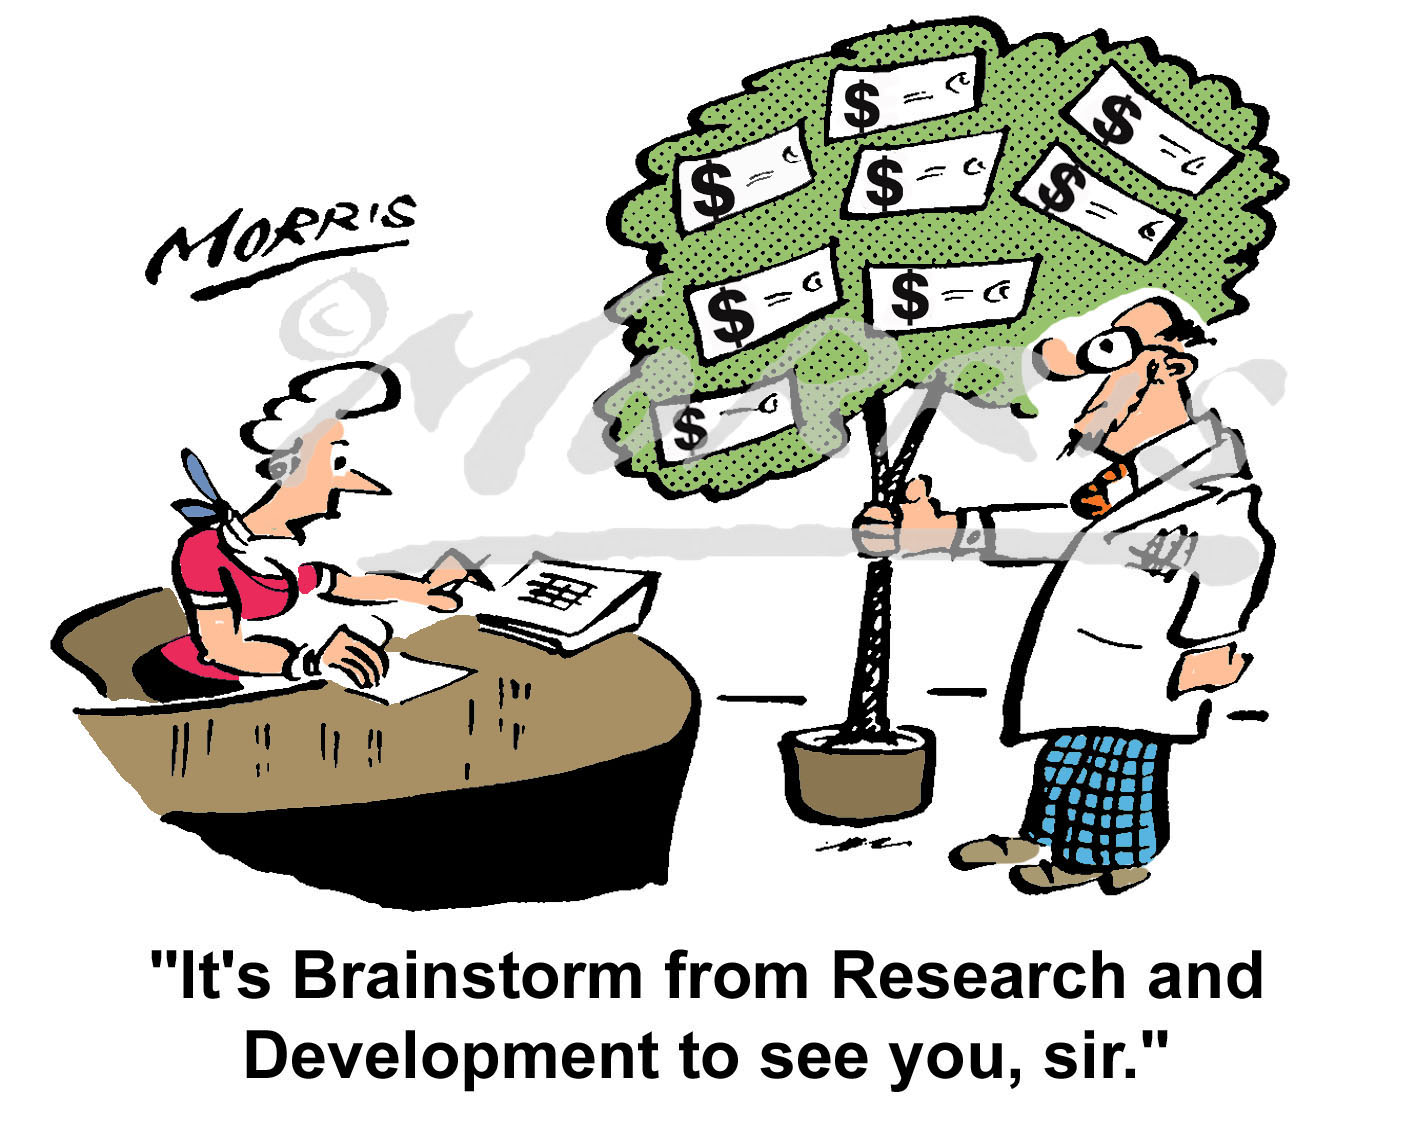 Money Tree Research and Development comic cartoon – Ref: 2209colus